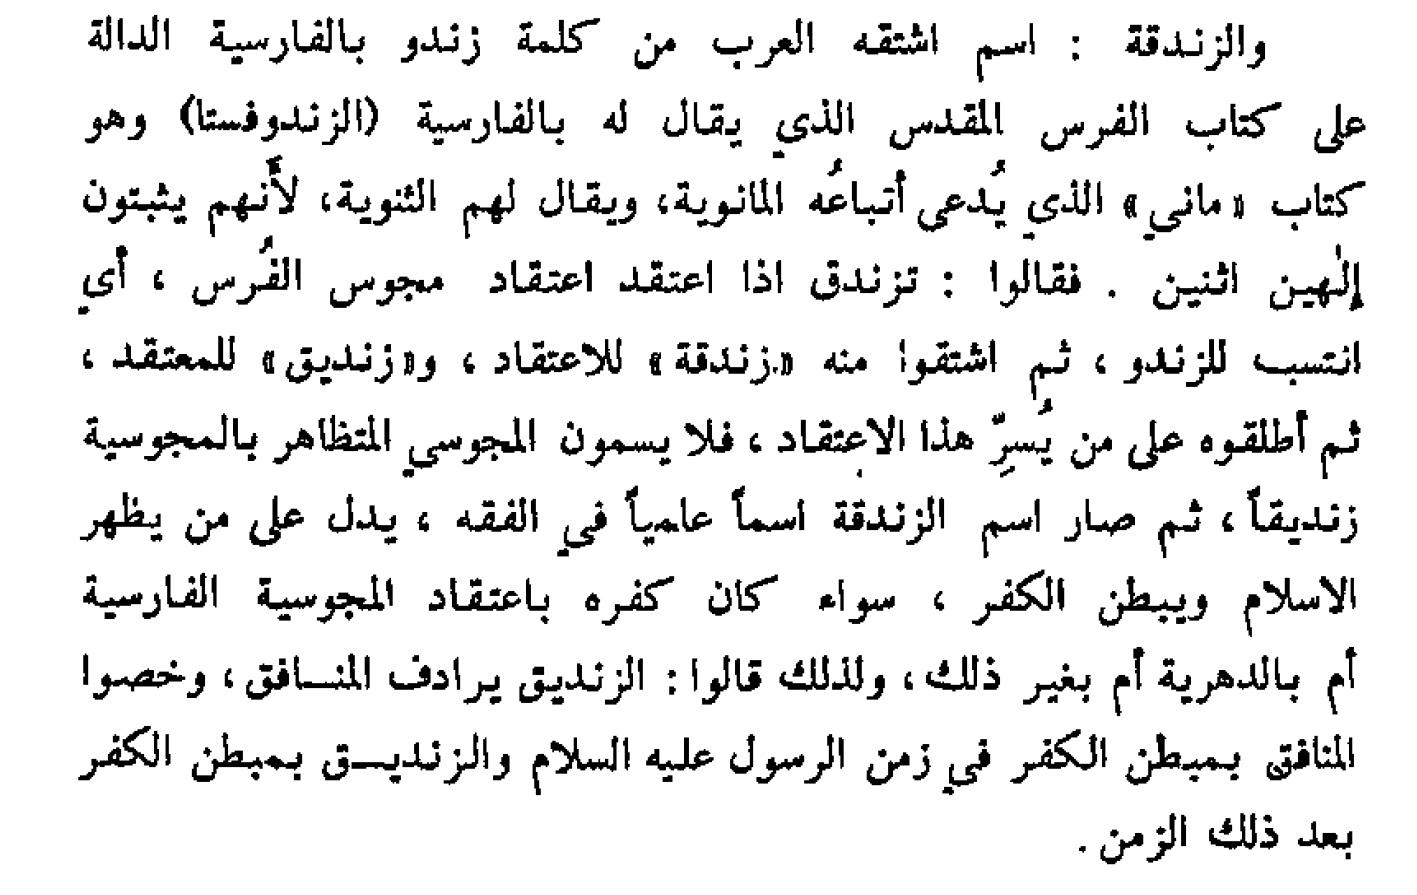 بالصور معنى زنديق , ماتعنيه كلمه زنديق 2866 1